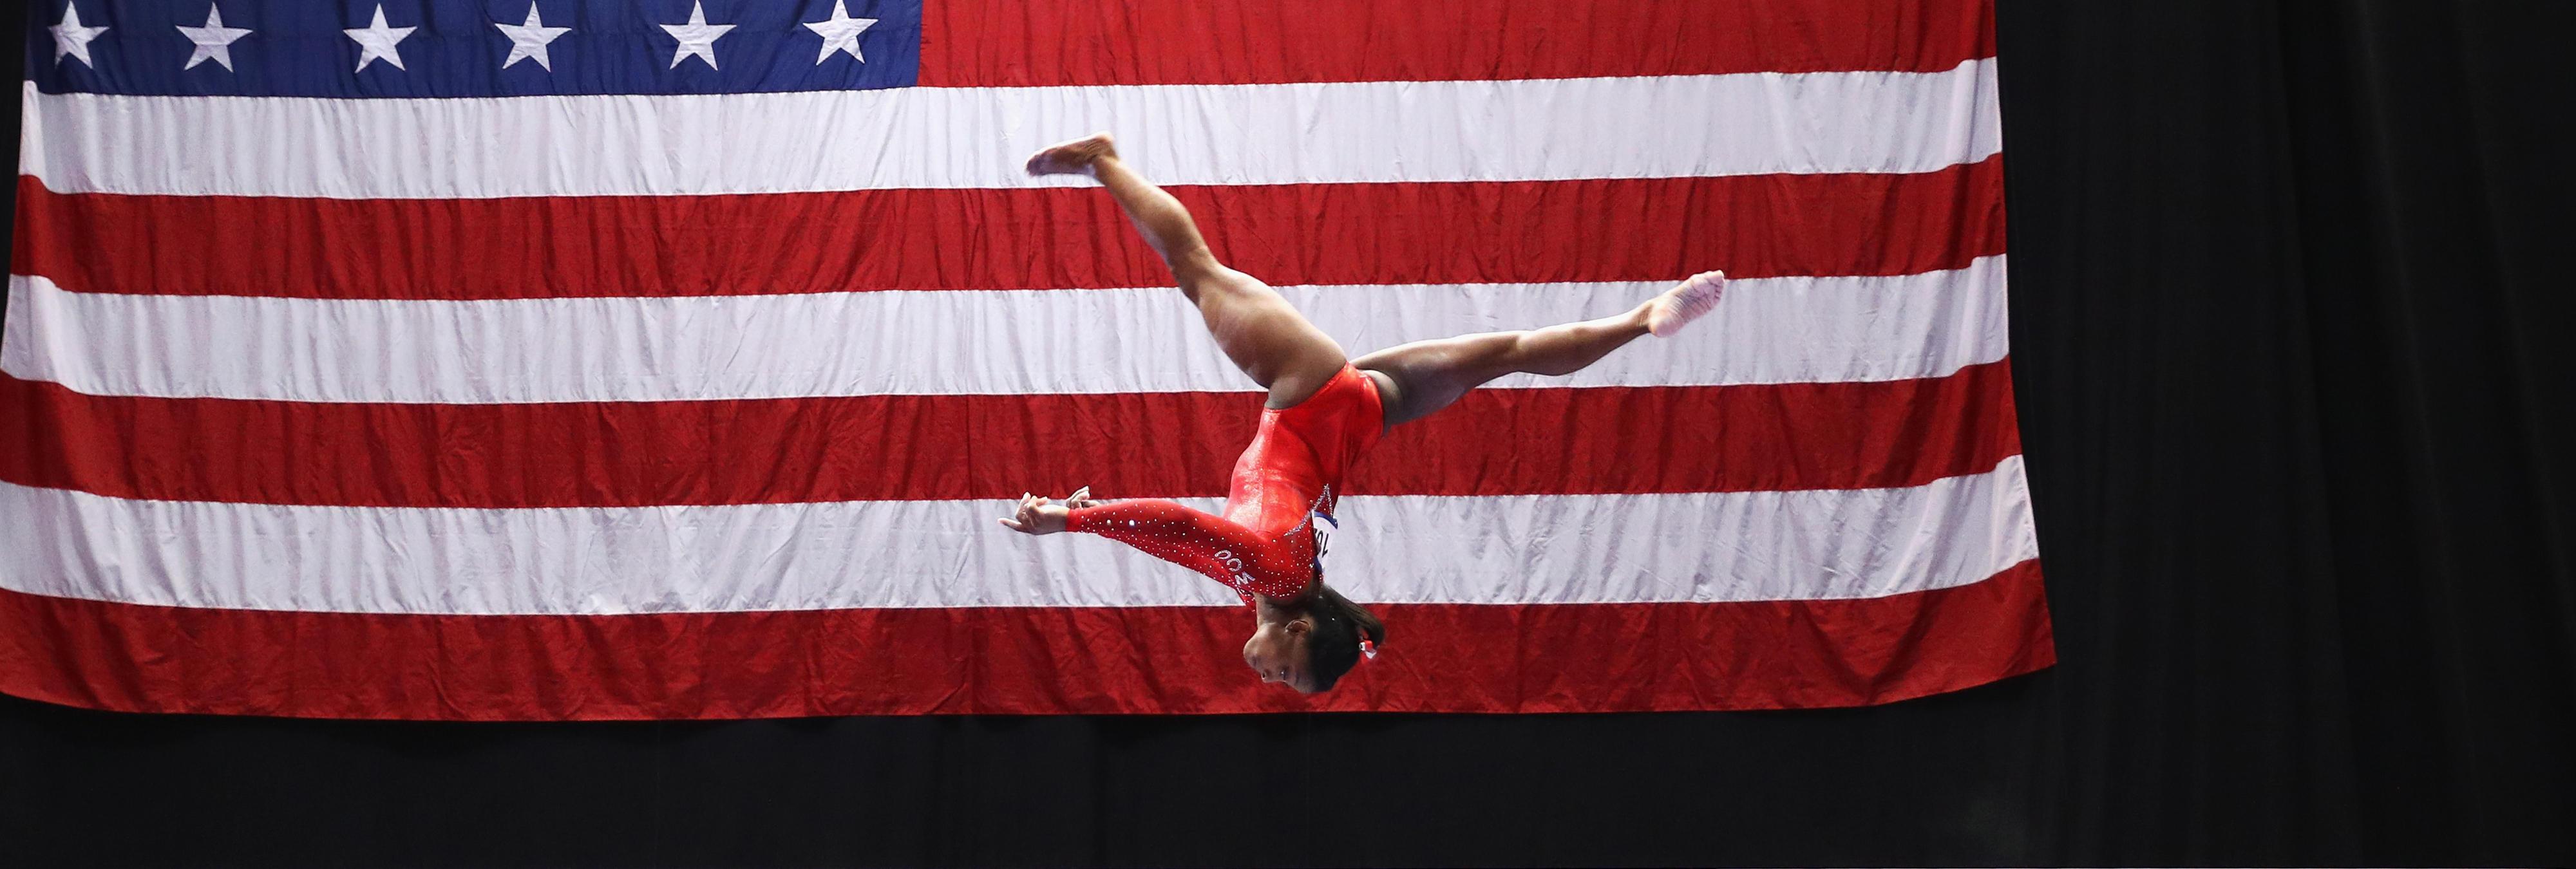 ¿Por qué la gimnasta estadounidense Simone Biles mola tanto?